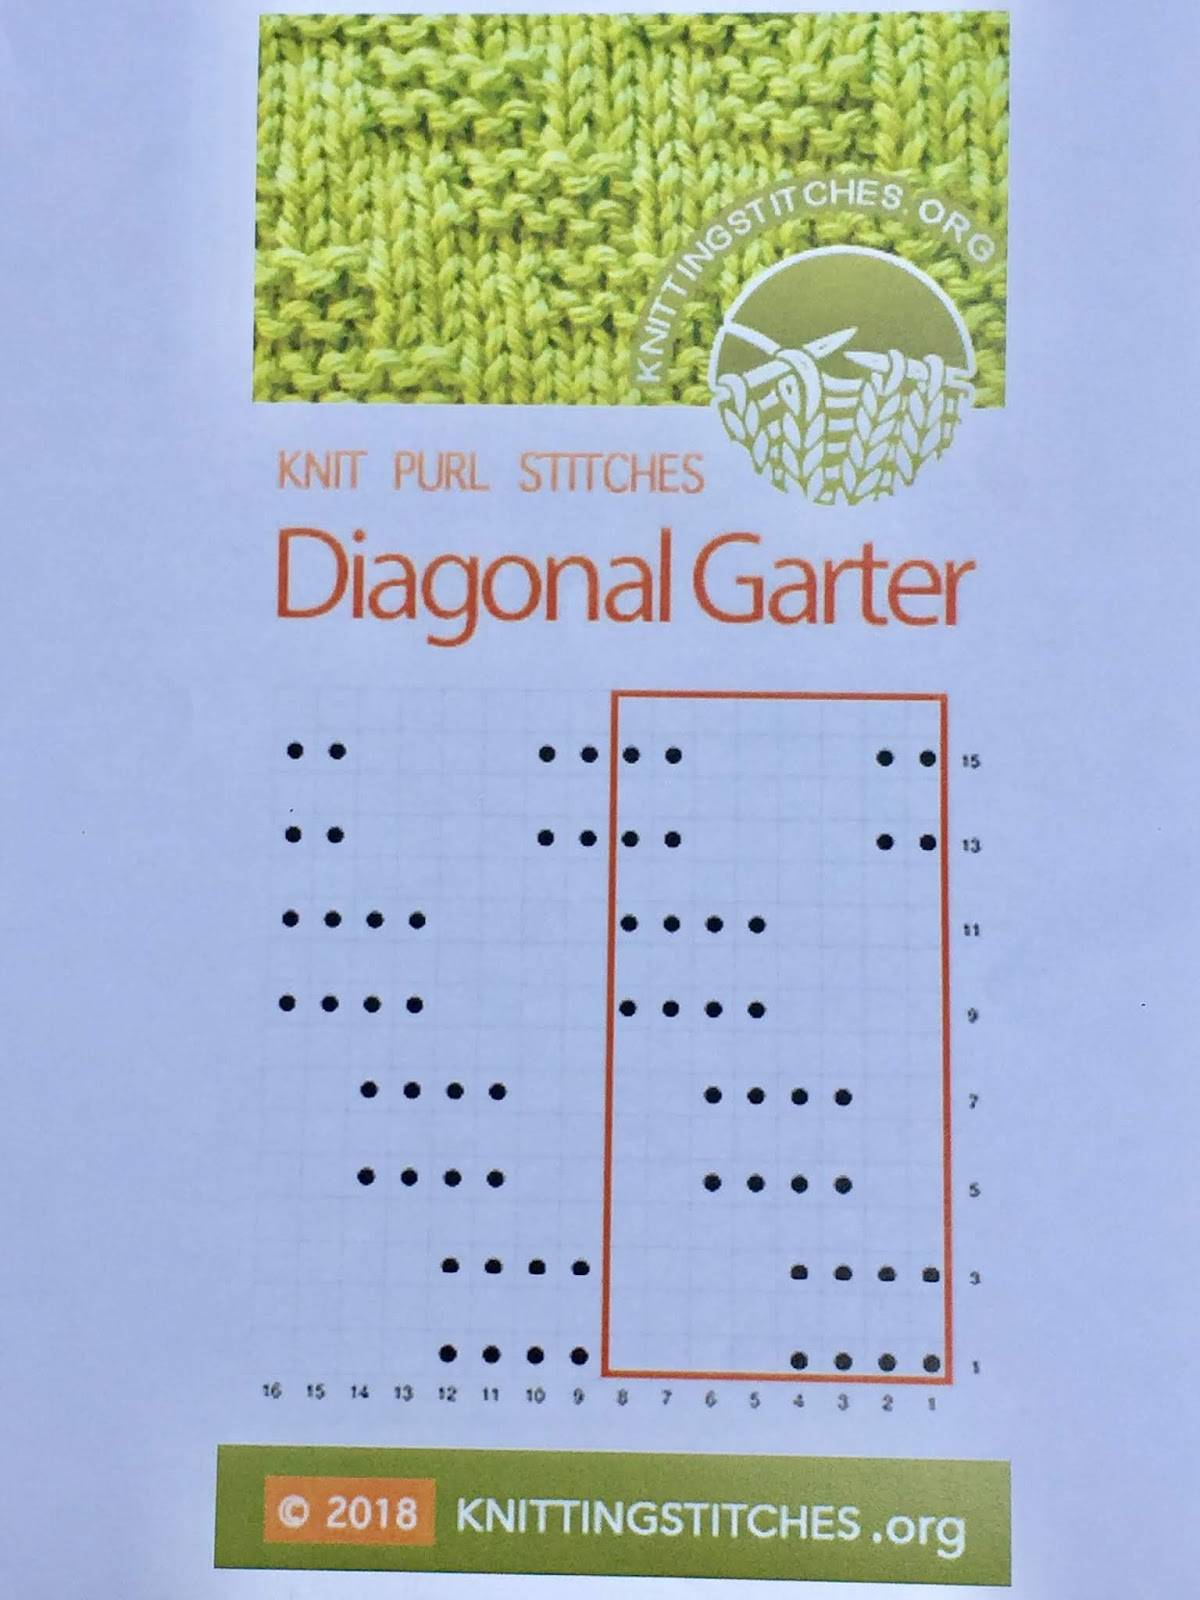 Knitting Stitches 2018 - Diagonal Garter Knit Purl stitch